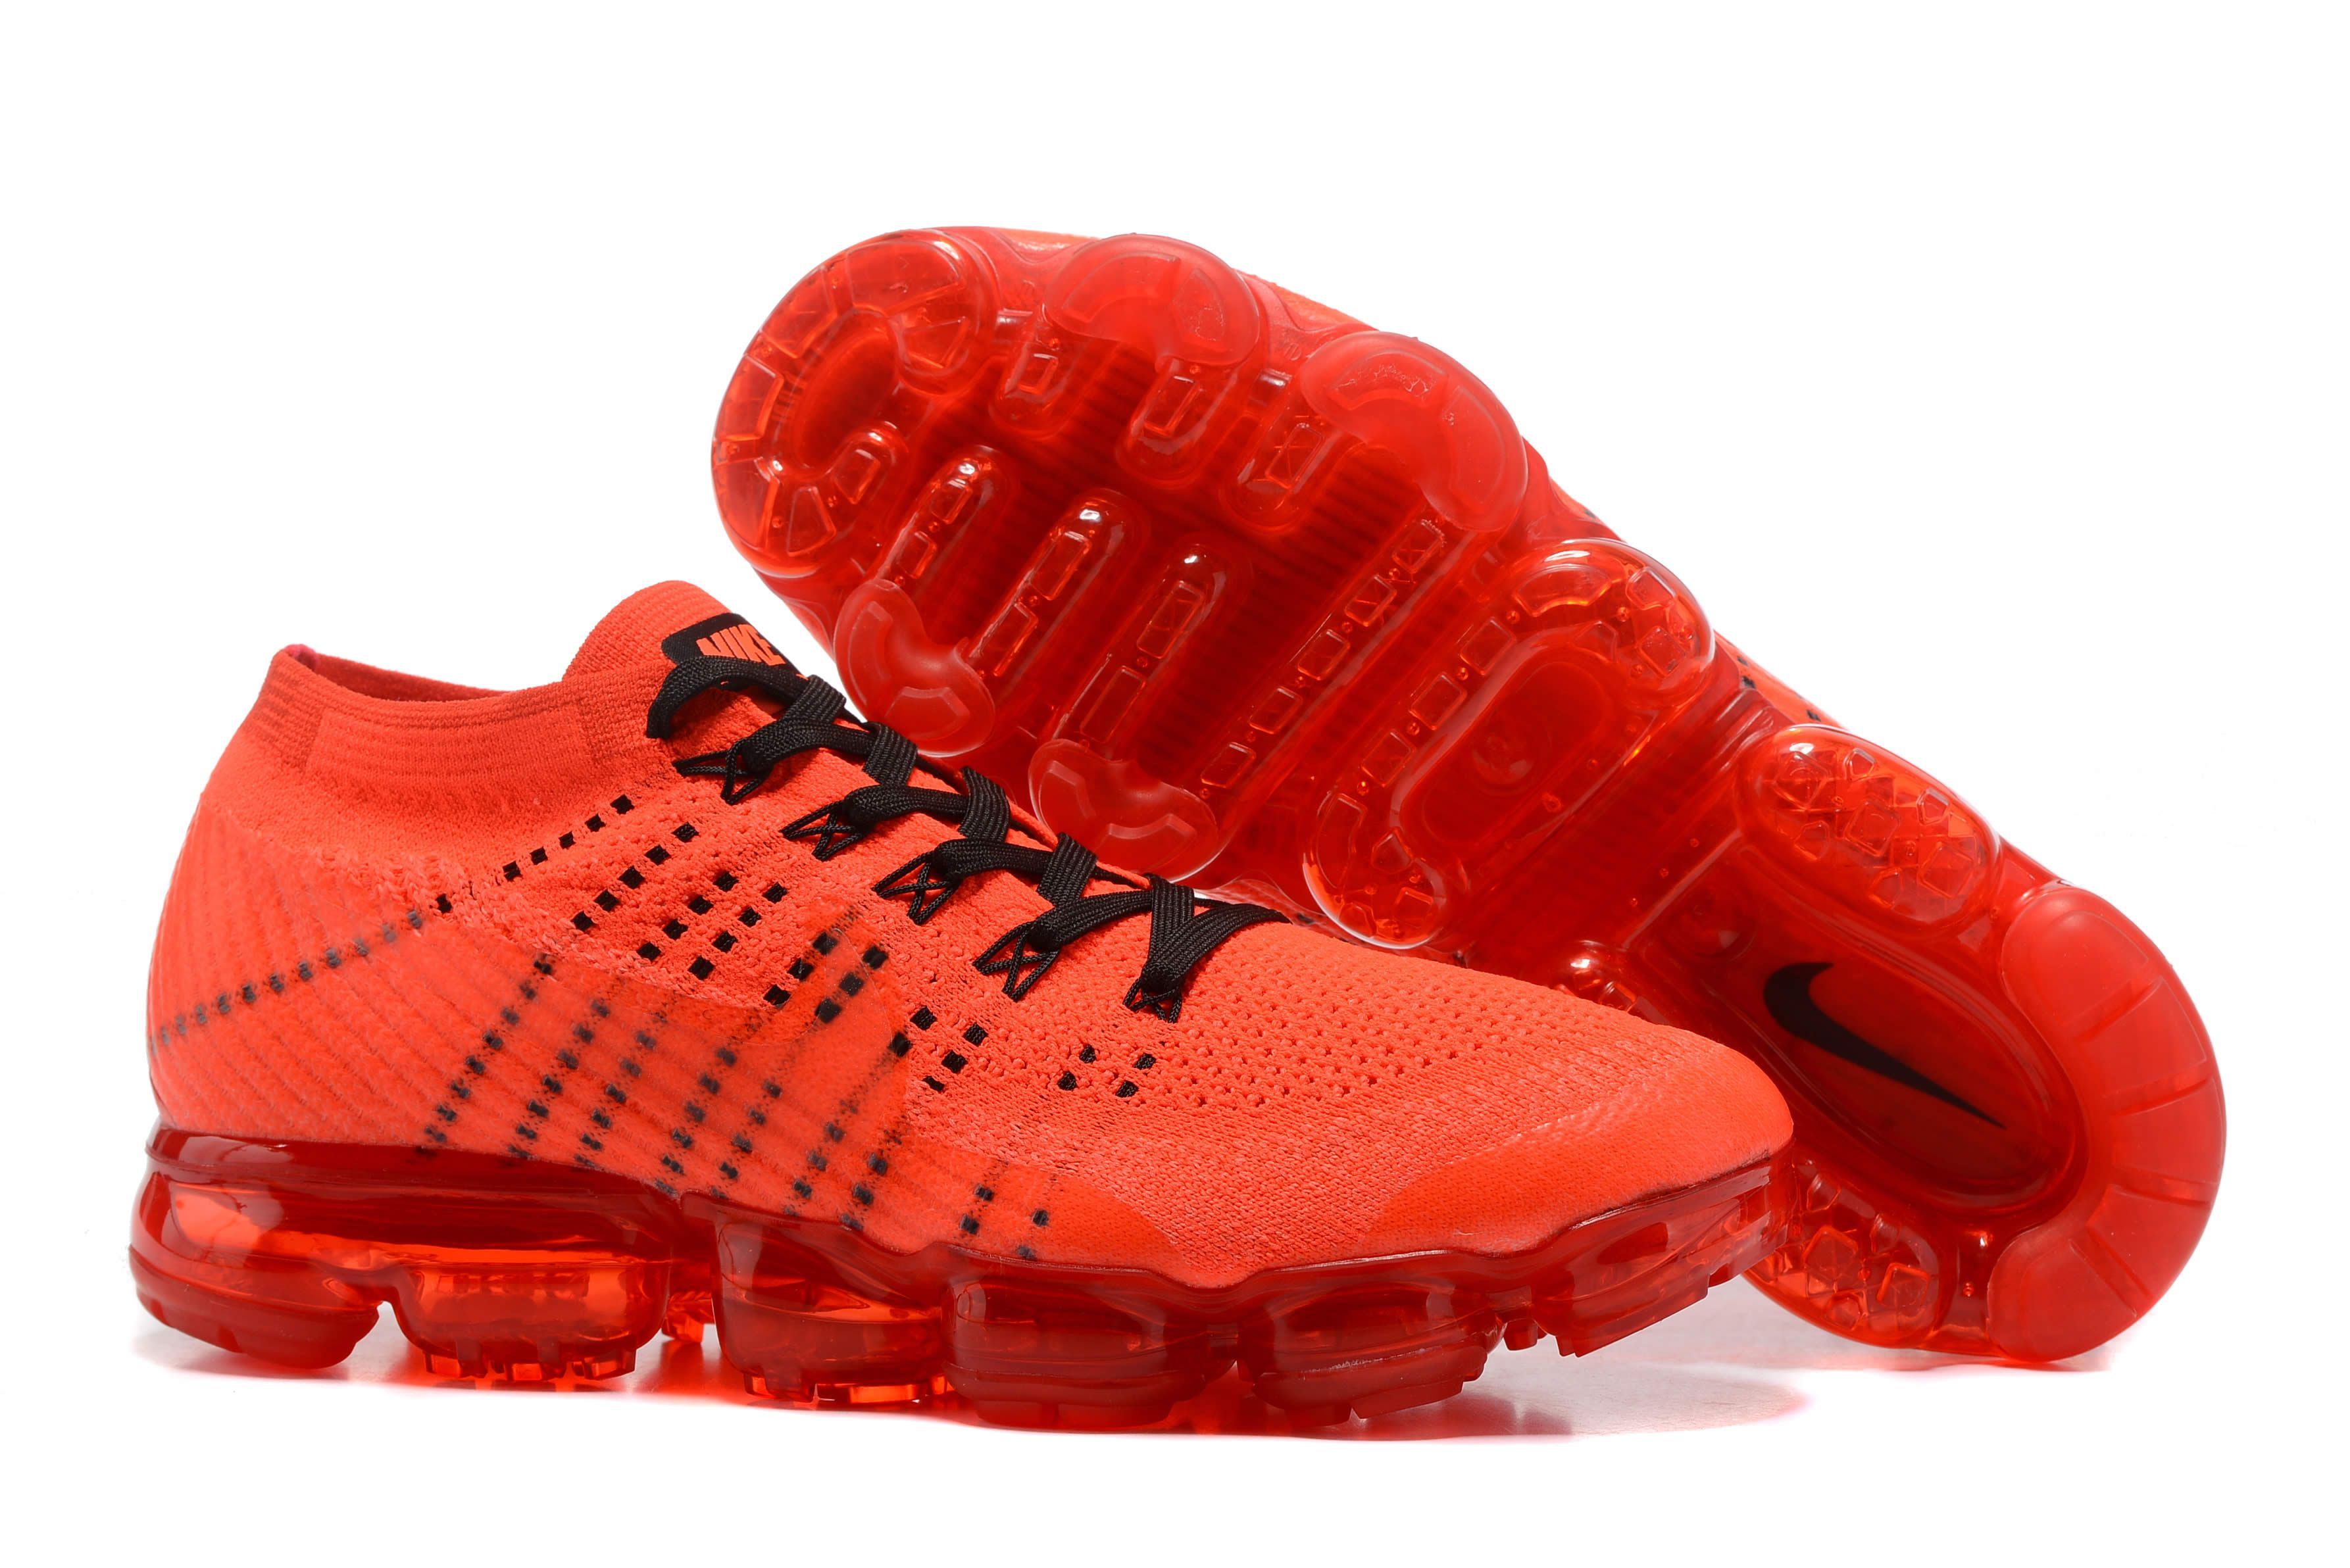 ff54ab94aa australia nike air vapormax mens running shoes black red 7fd8d 96aea; italy men  nike air vapormax flyknit red e6e2b e4fcf